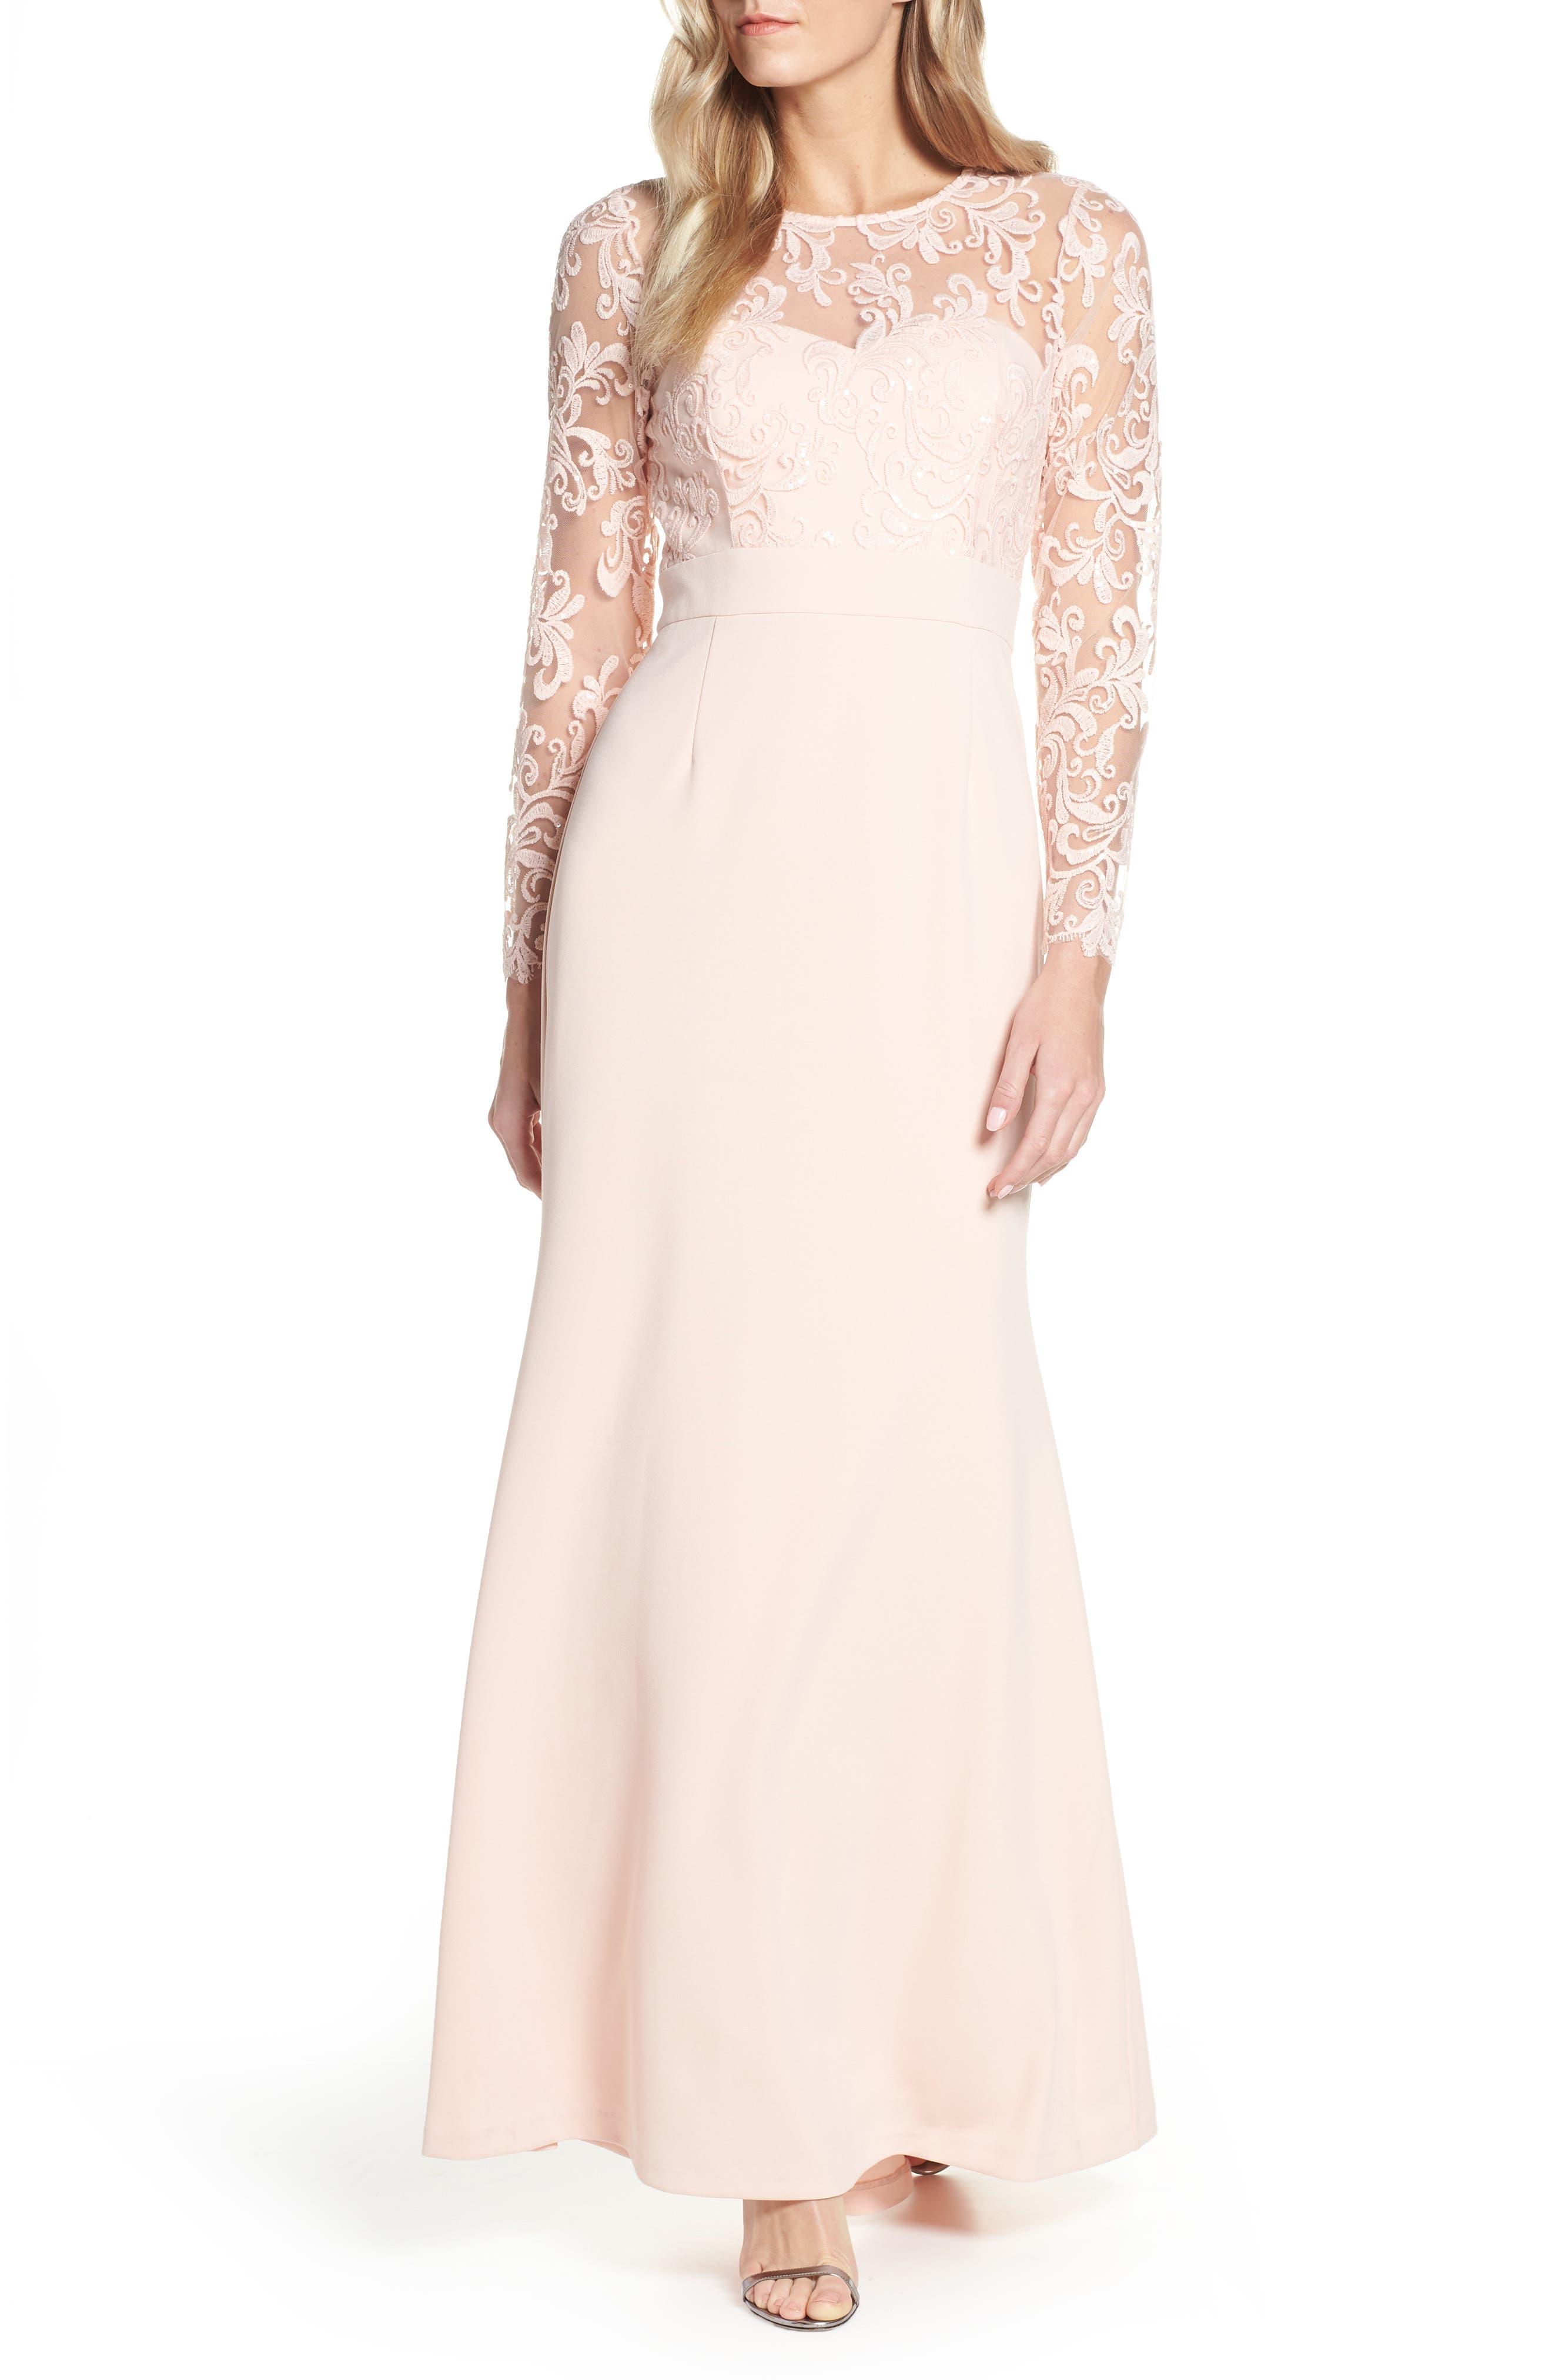 ELIZA J, Embroidered Bodice Crepe Evening Dress, Main thumbnail 1, color, BLUSH